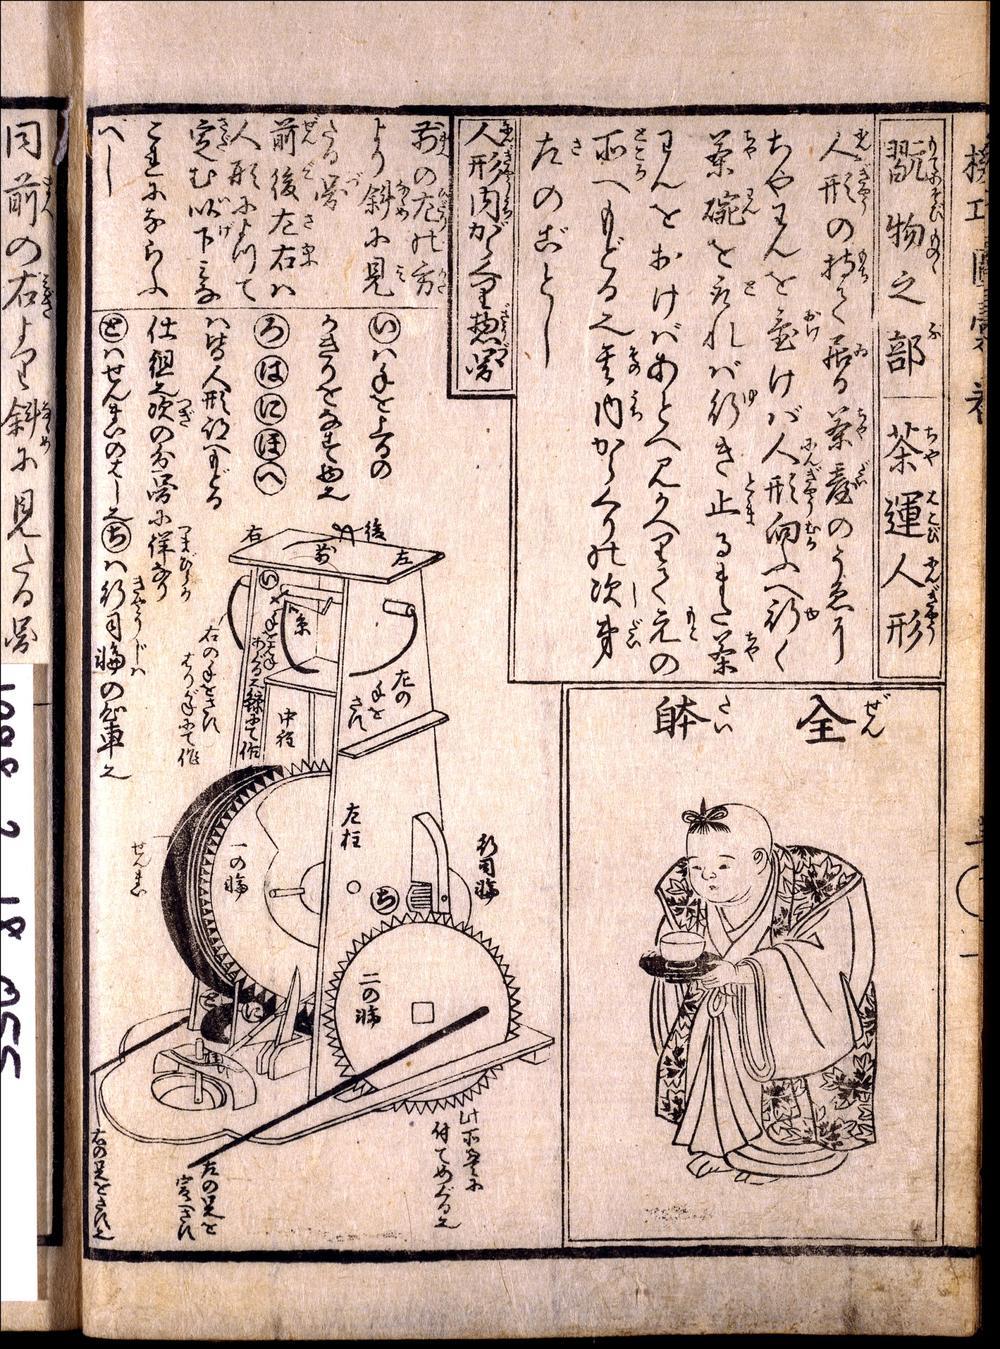 Hosokawa Hanzo Yorinao (author, 1741/2- 1796) and  Suwaraya Ichibei (publisher, 1762-99), Kikō zui [Illustrated Compendium of Clever Machines]), also known as Karakuri zui [The Illustrated Compendium of Automata]), 1796